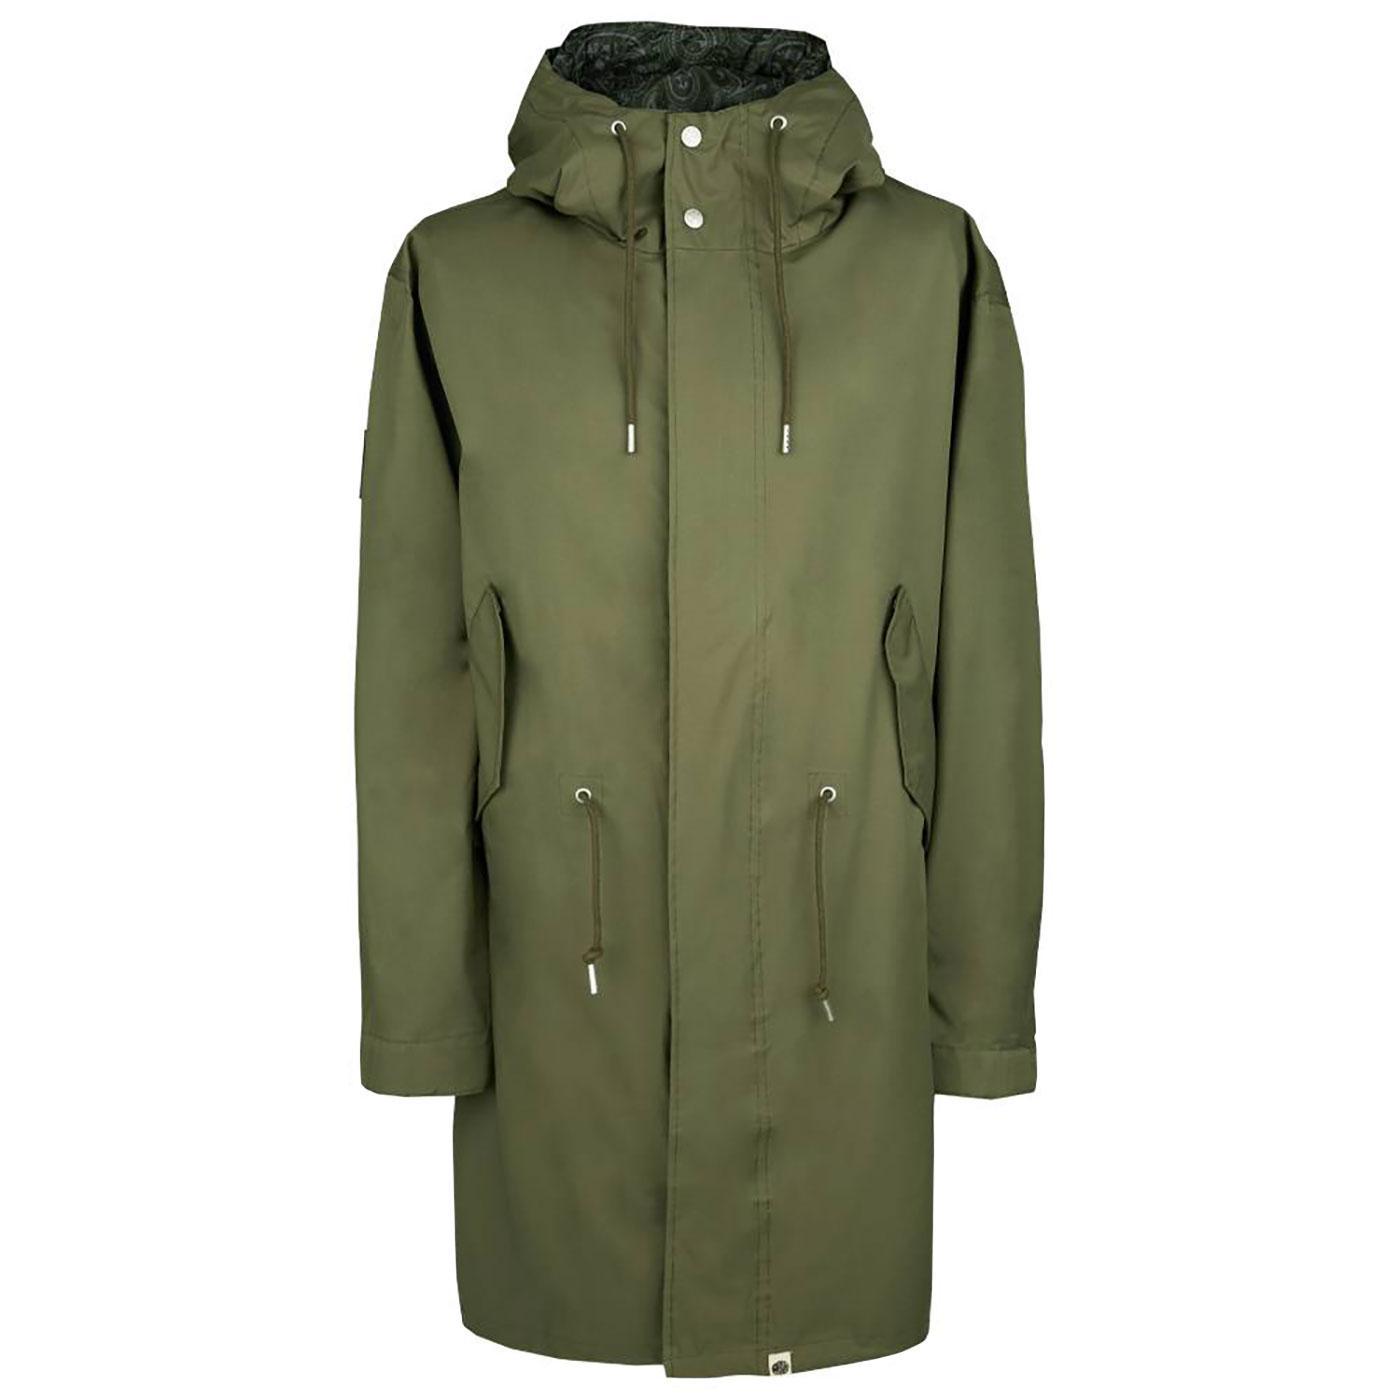 PRETTY GREEN Sealed Technical Mod Parka Jacket